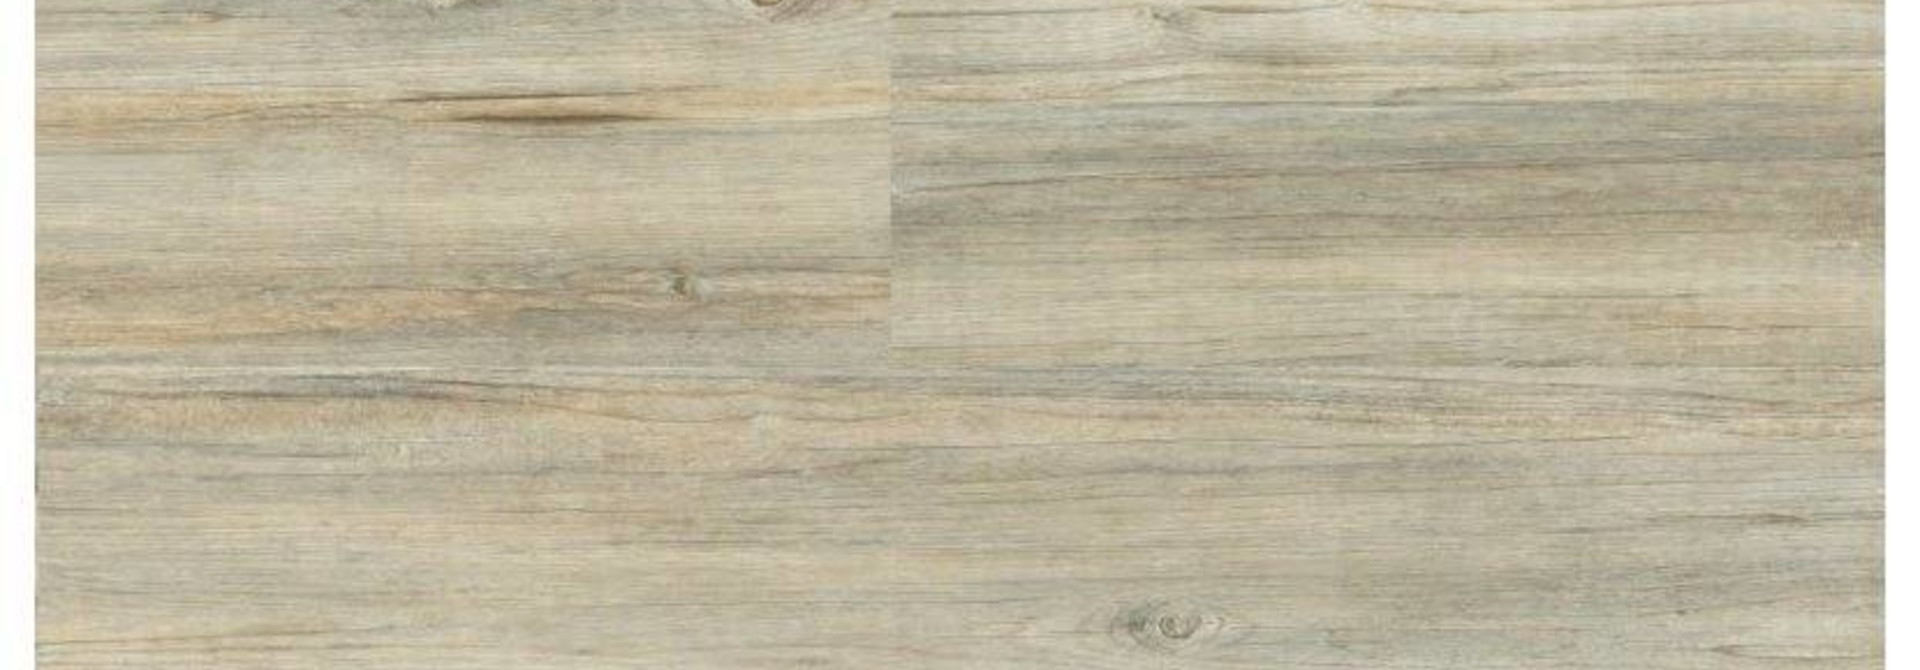 Natural Cracked Wood 5826